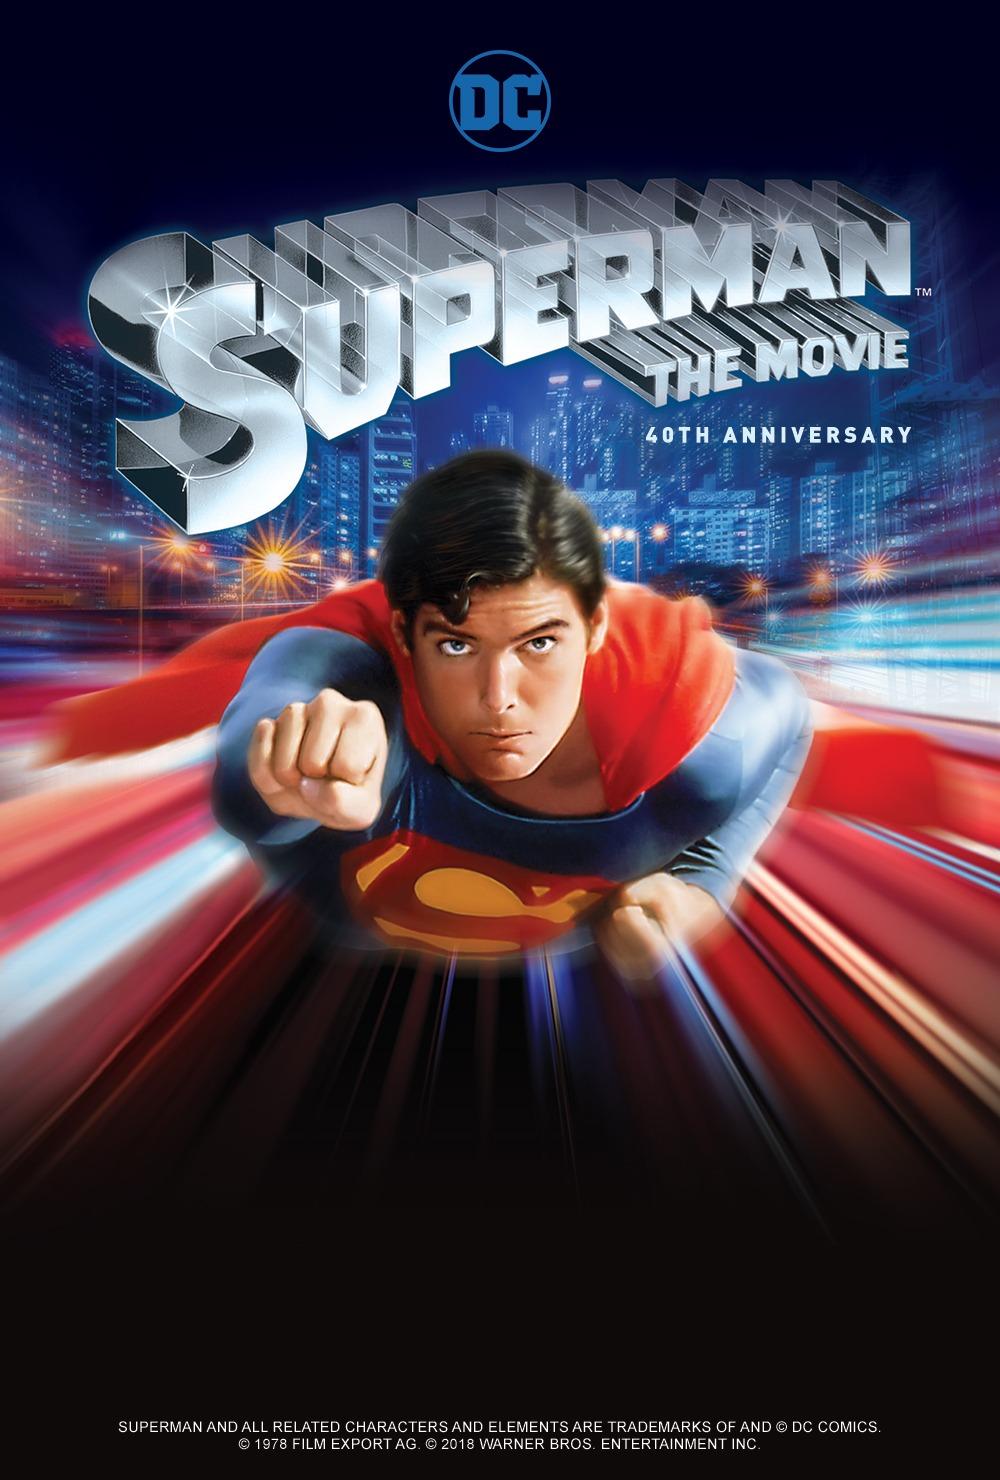 Superman: The Movie 40th Anniversity Celebrational Return To the Big Screen – A Fathom Event